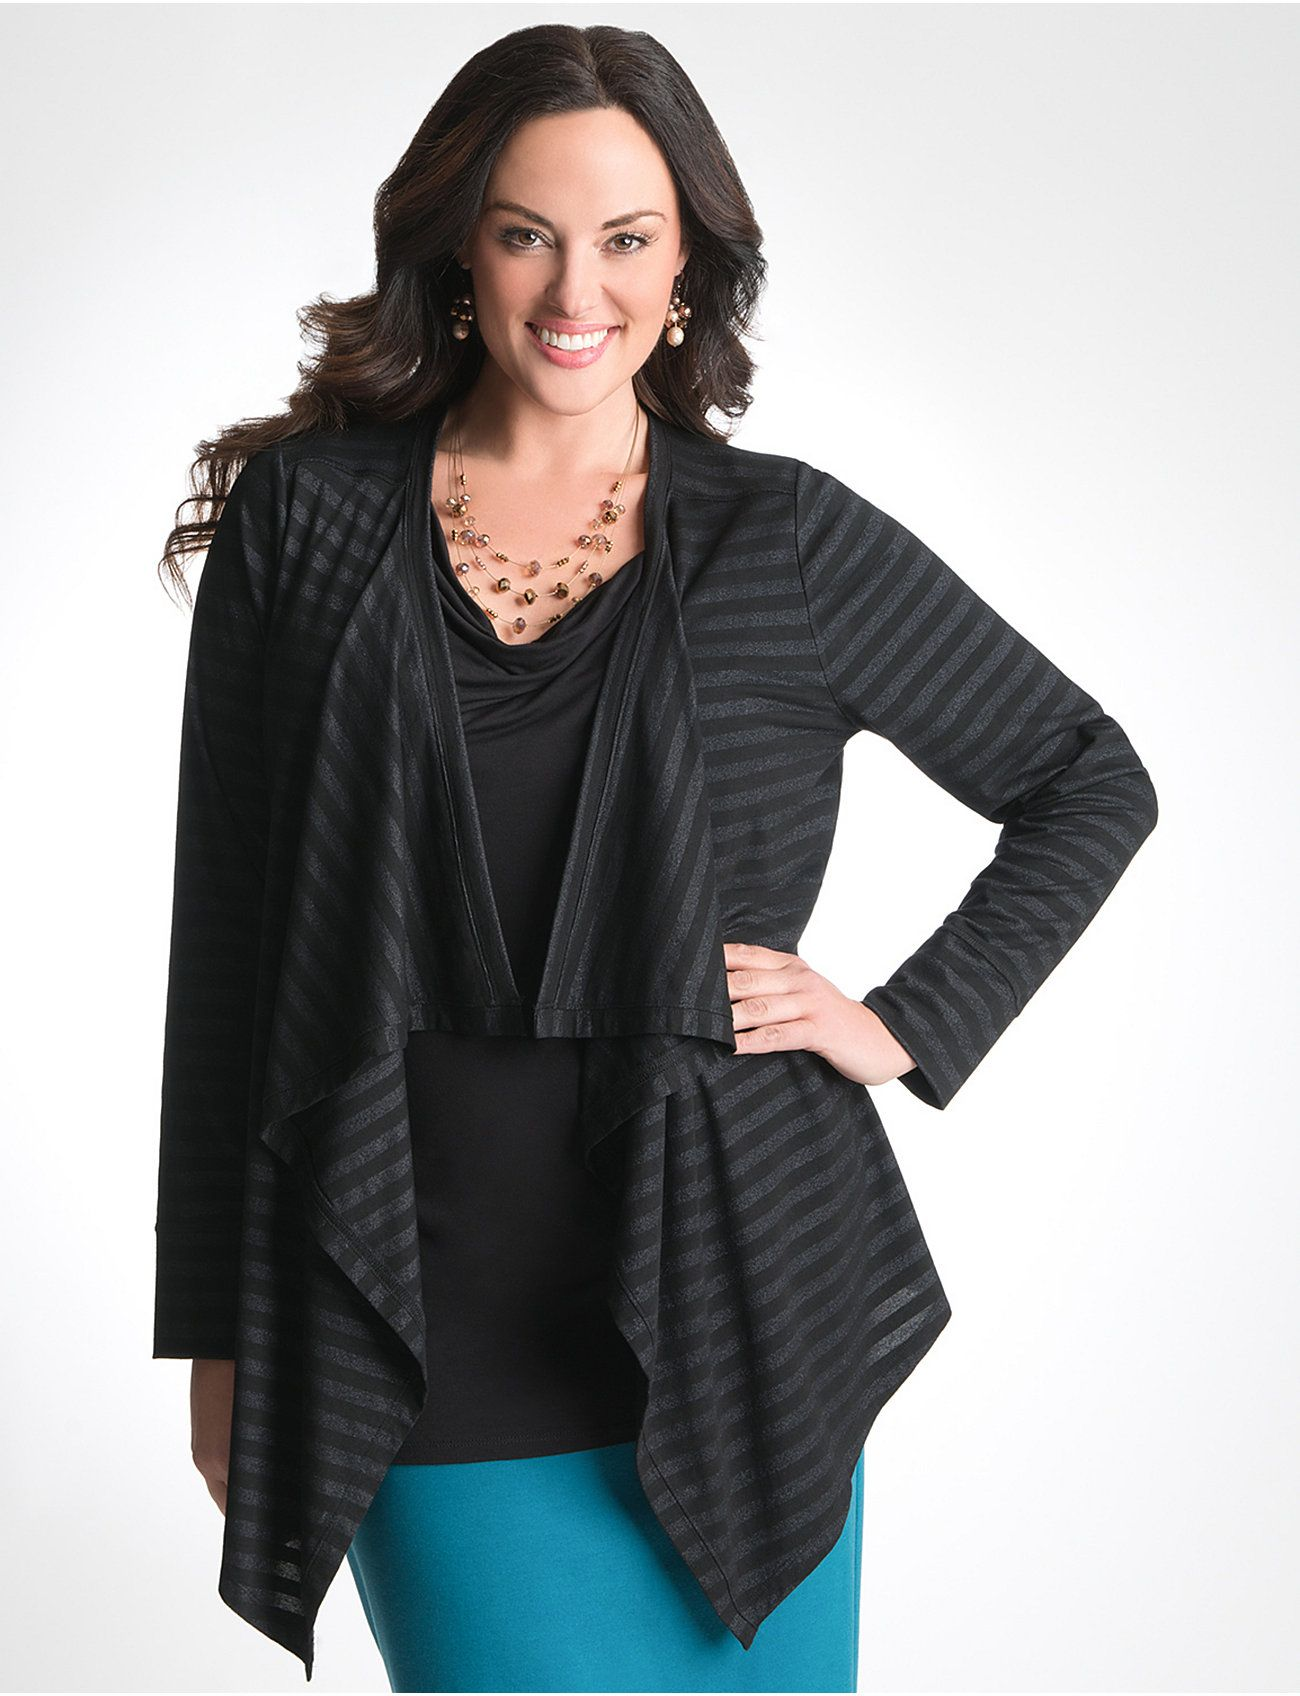 Womens Plus Size Tops, Tees, Cardigans & Blouses | Lane Bryant ...